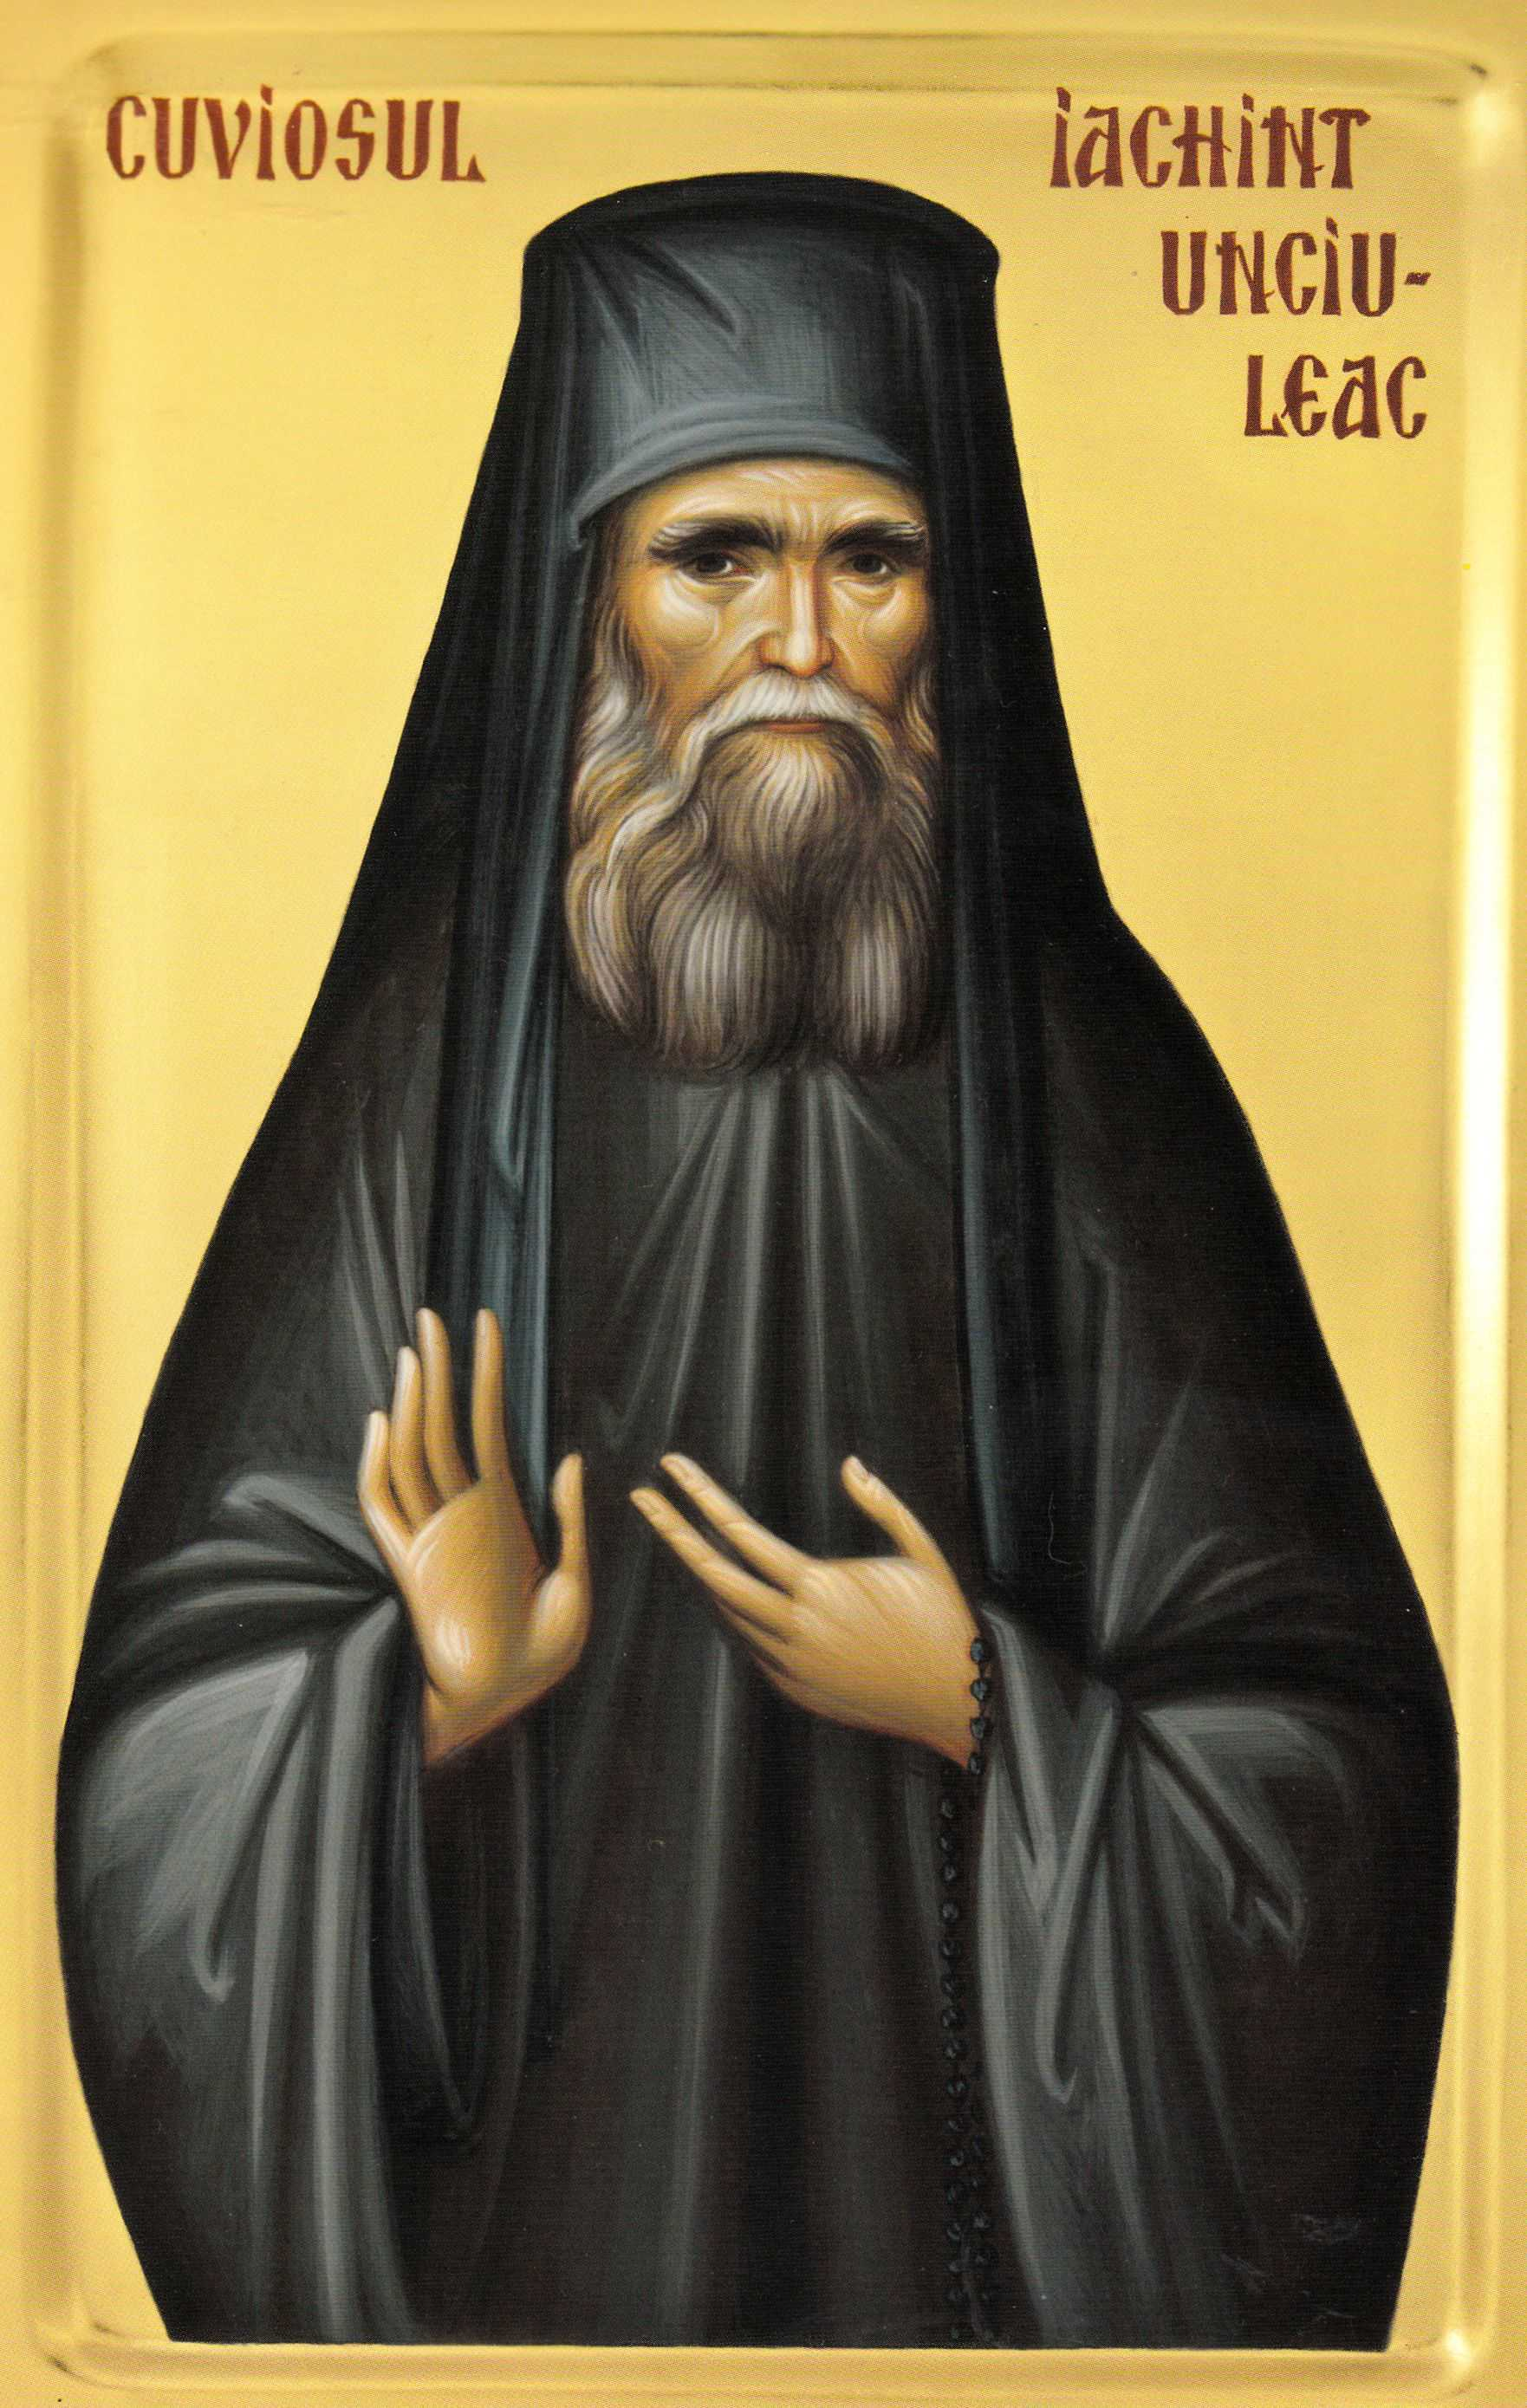 PARINTELE IACHINT, STARETUL SI DUHOVNICUL (†23 iunie 1998) &#8211; documentar video realizat de MANASTIREA PUTNA <i>(include inregistrari audio inedite si filmari emotionante cu marele duhovnic al Bucovinei)</i>